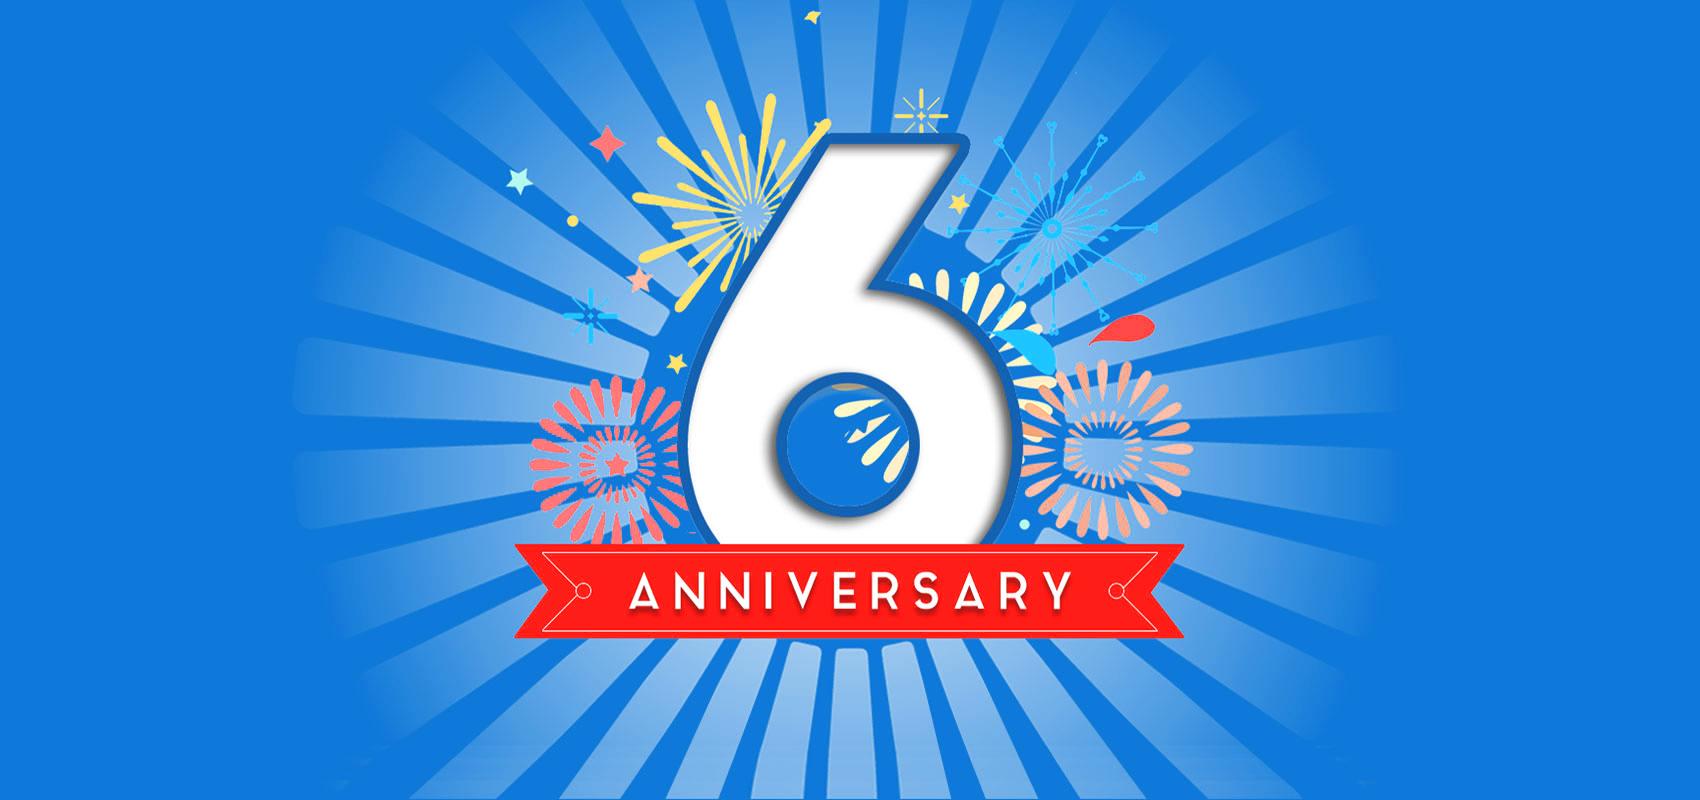 SEOeStore celebrates its 6th anniversary